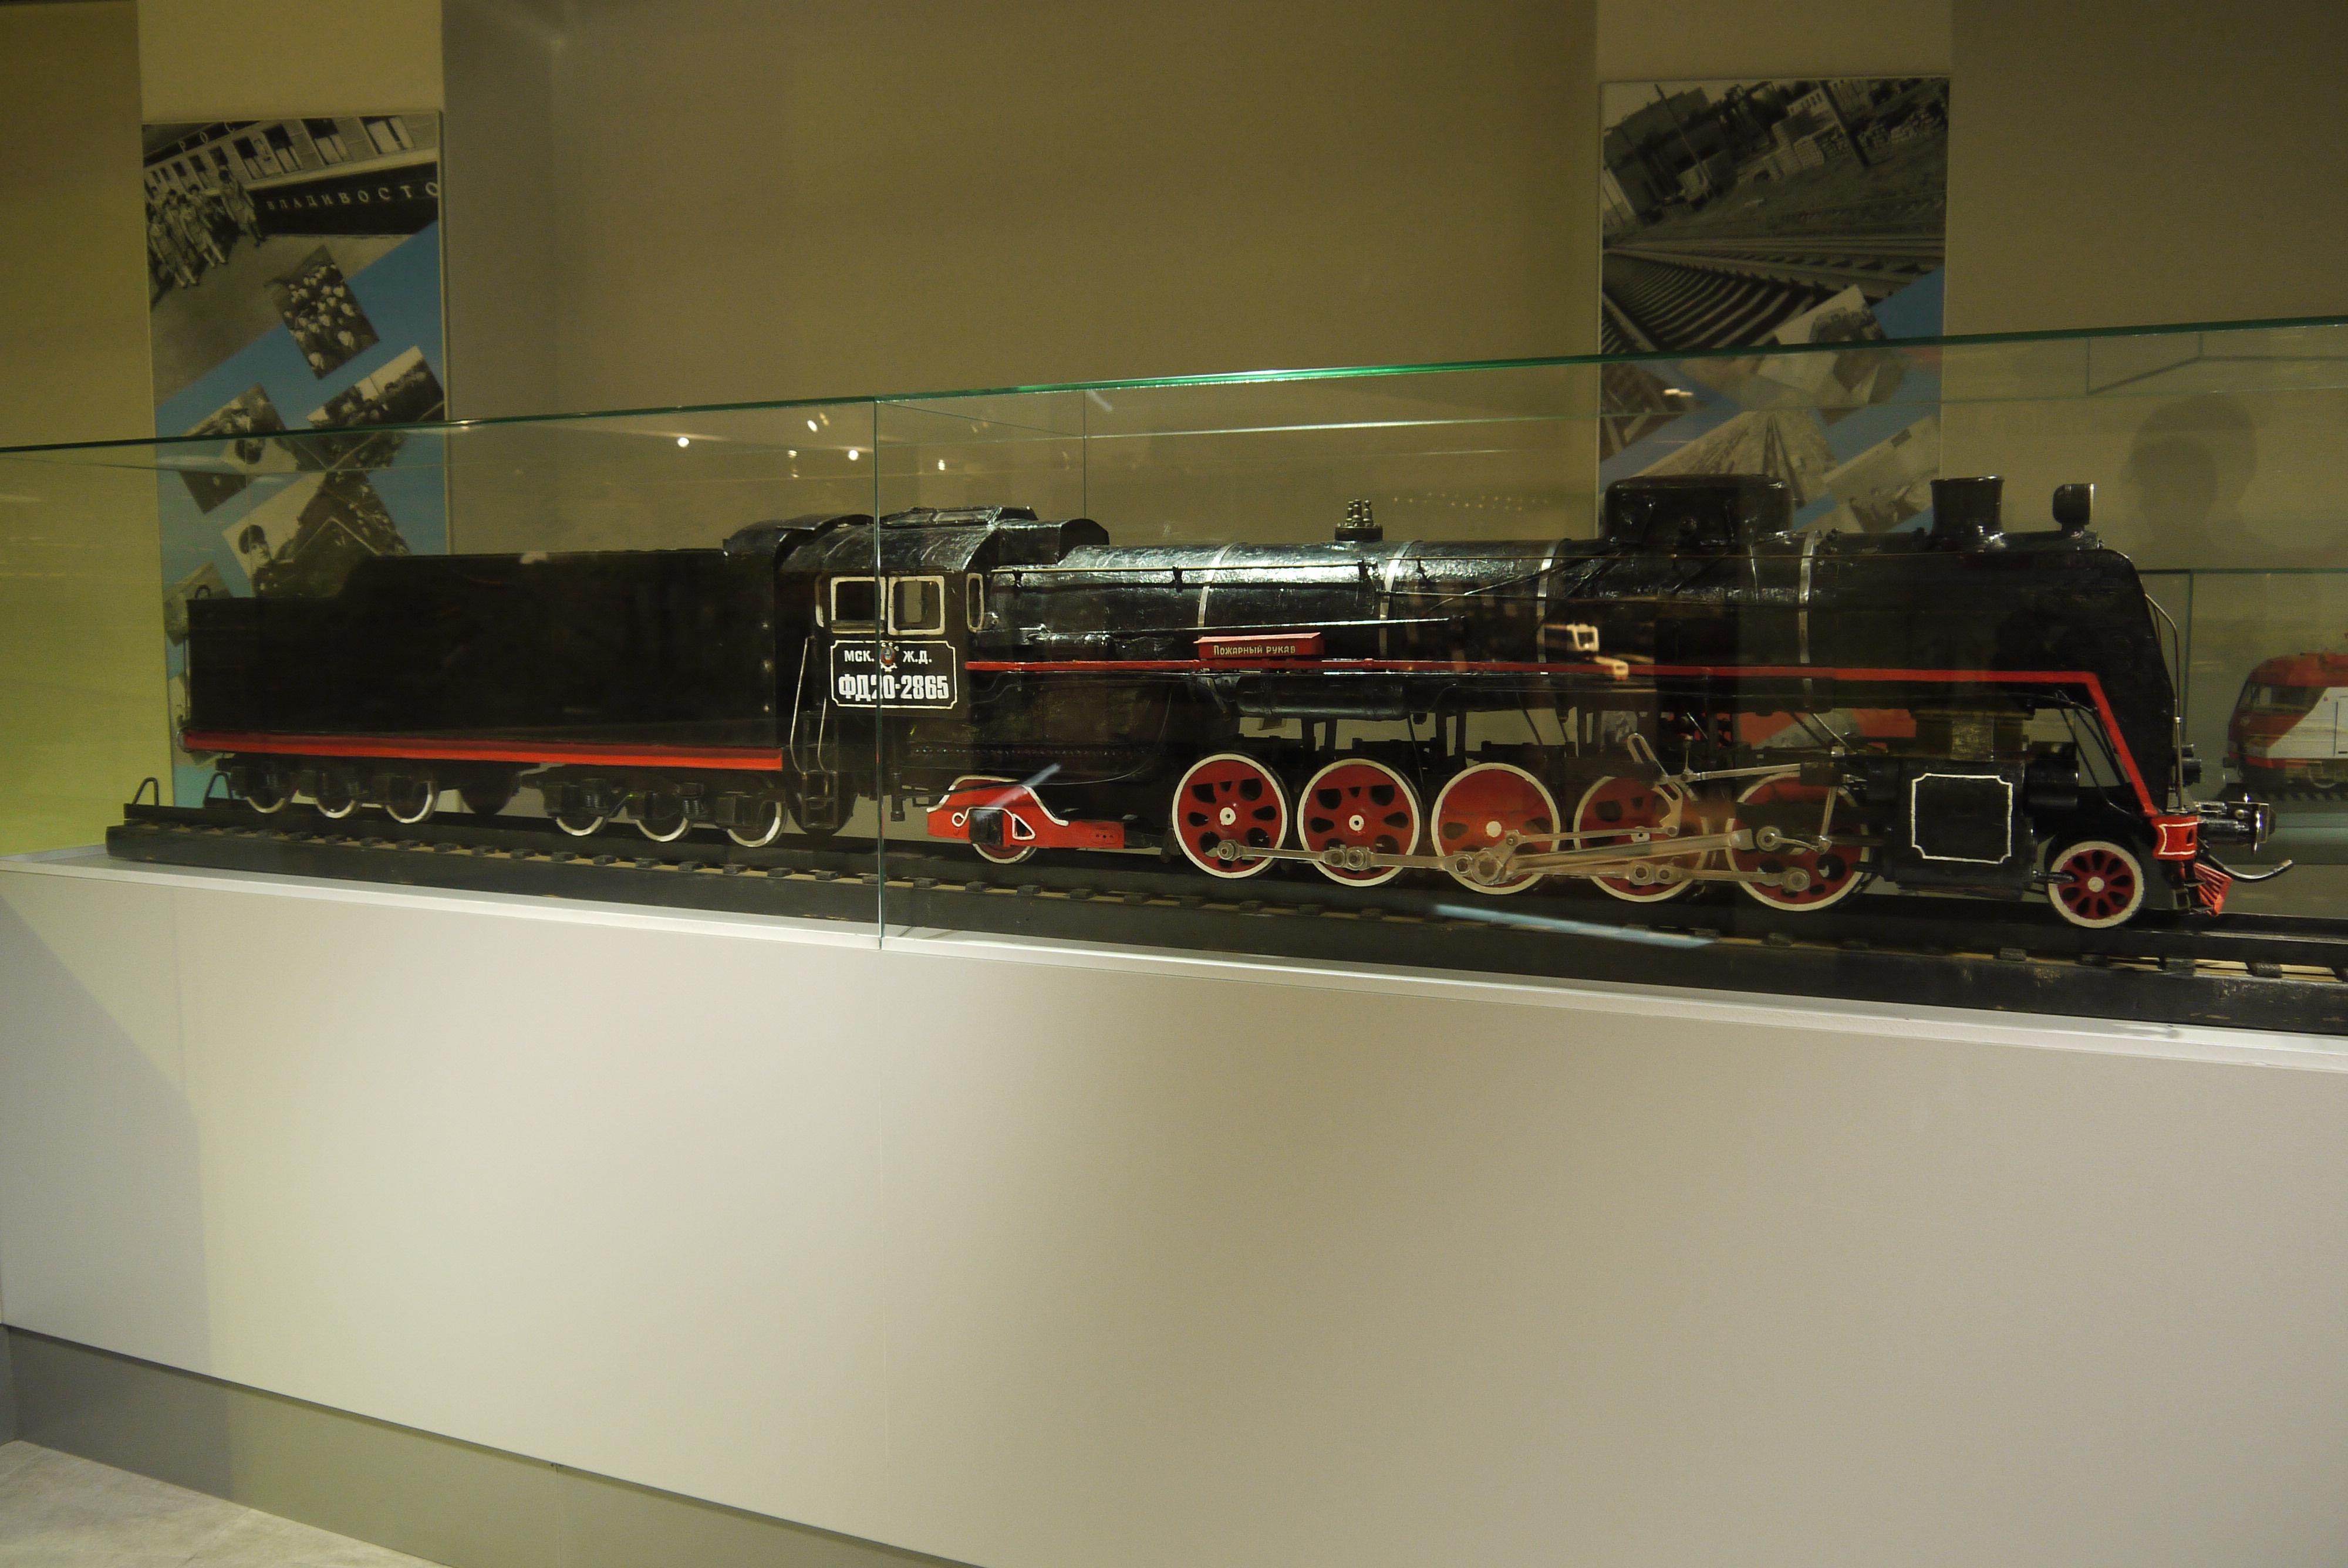 Model Railroad Scratch Building Structures Vol